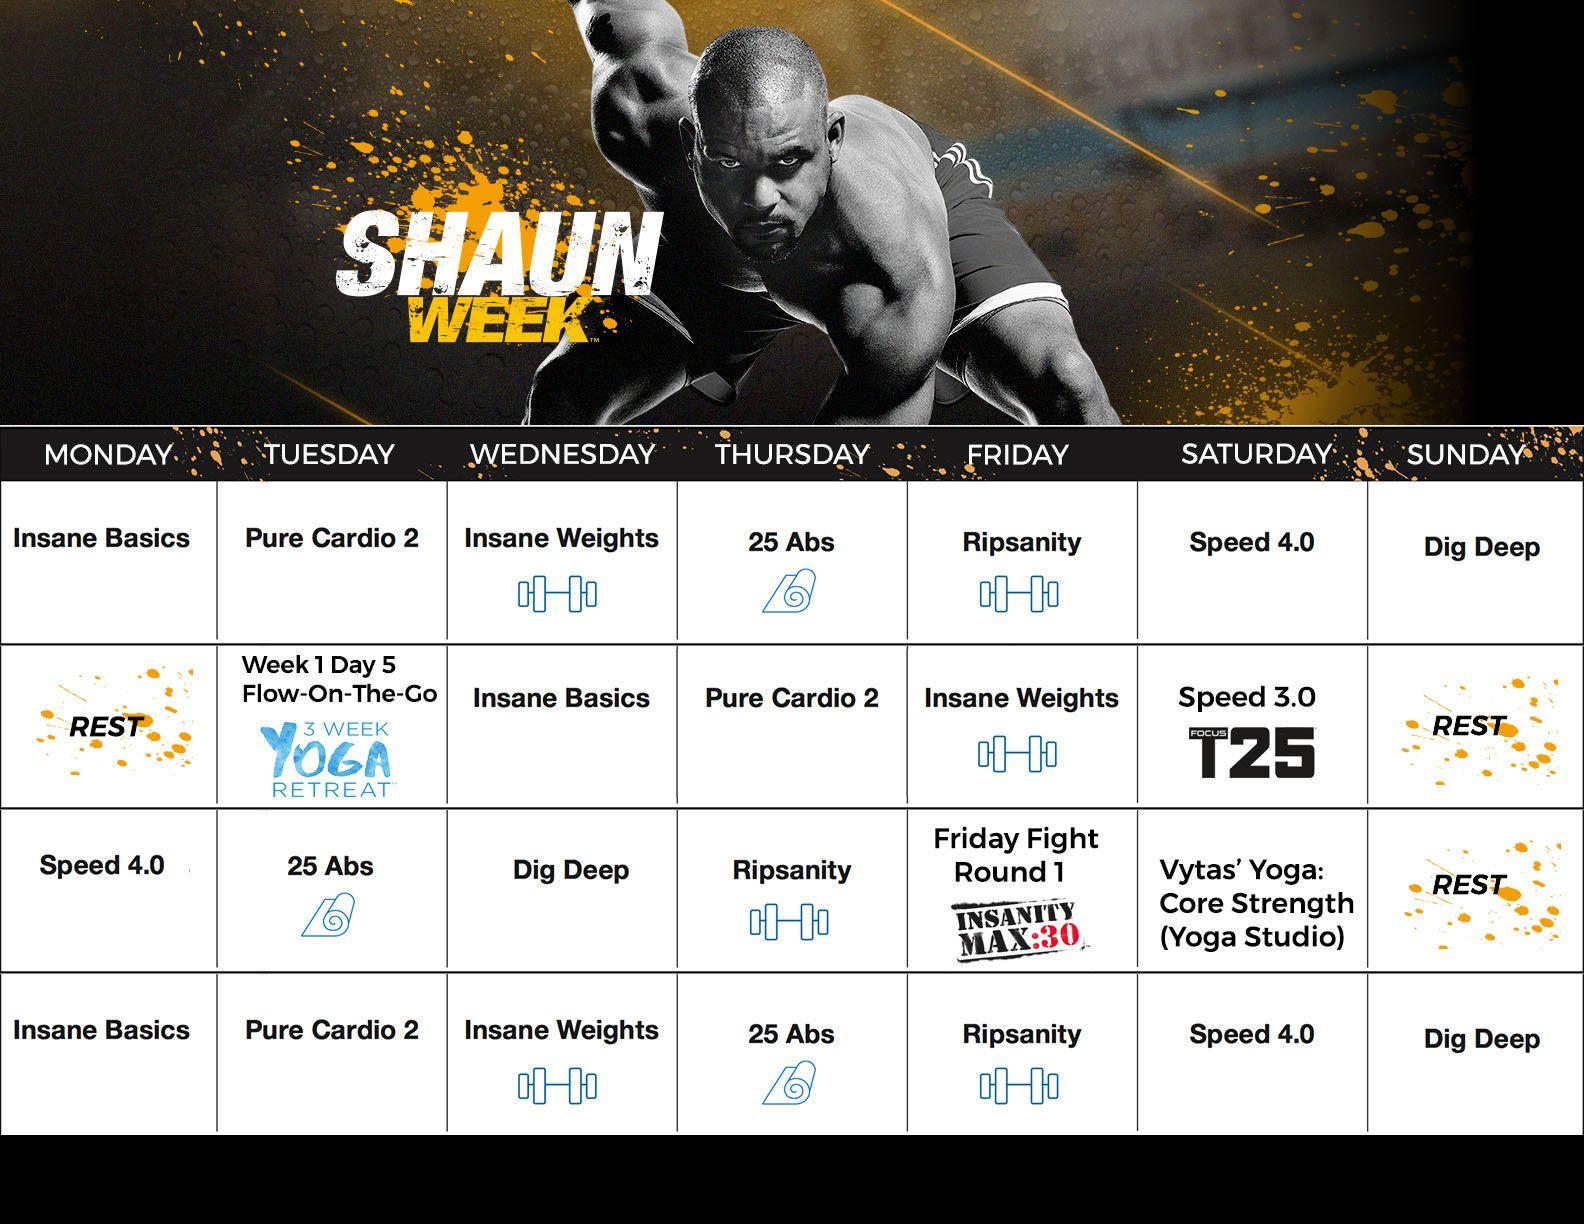 Shaun Week 30 Day Hybrid Fitness Calendar To Join My Next regarding Shaun T Hybrid Calendar